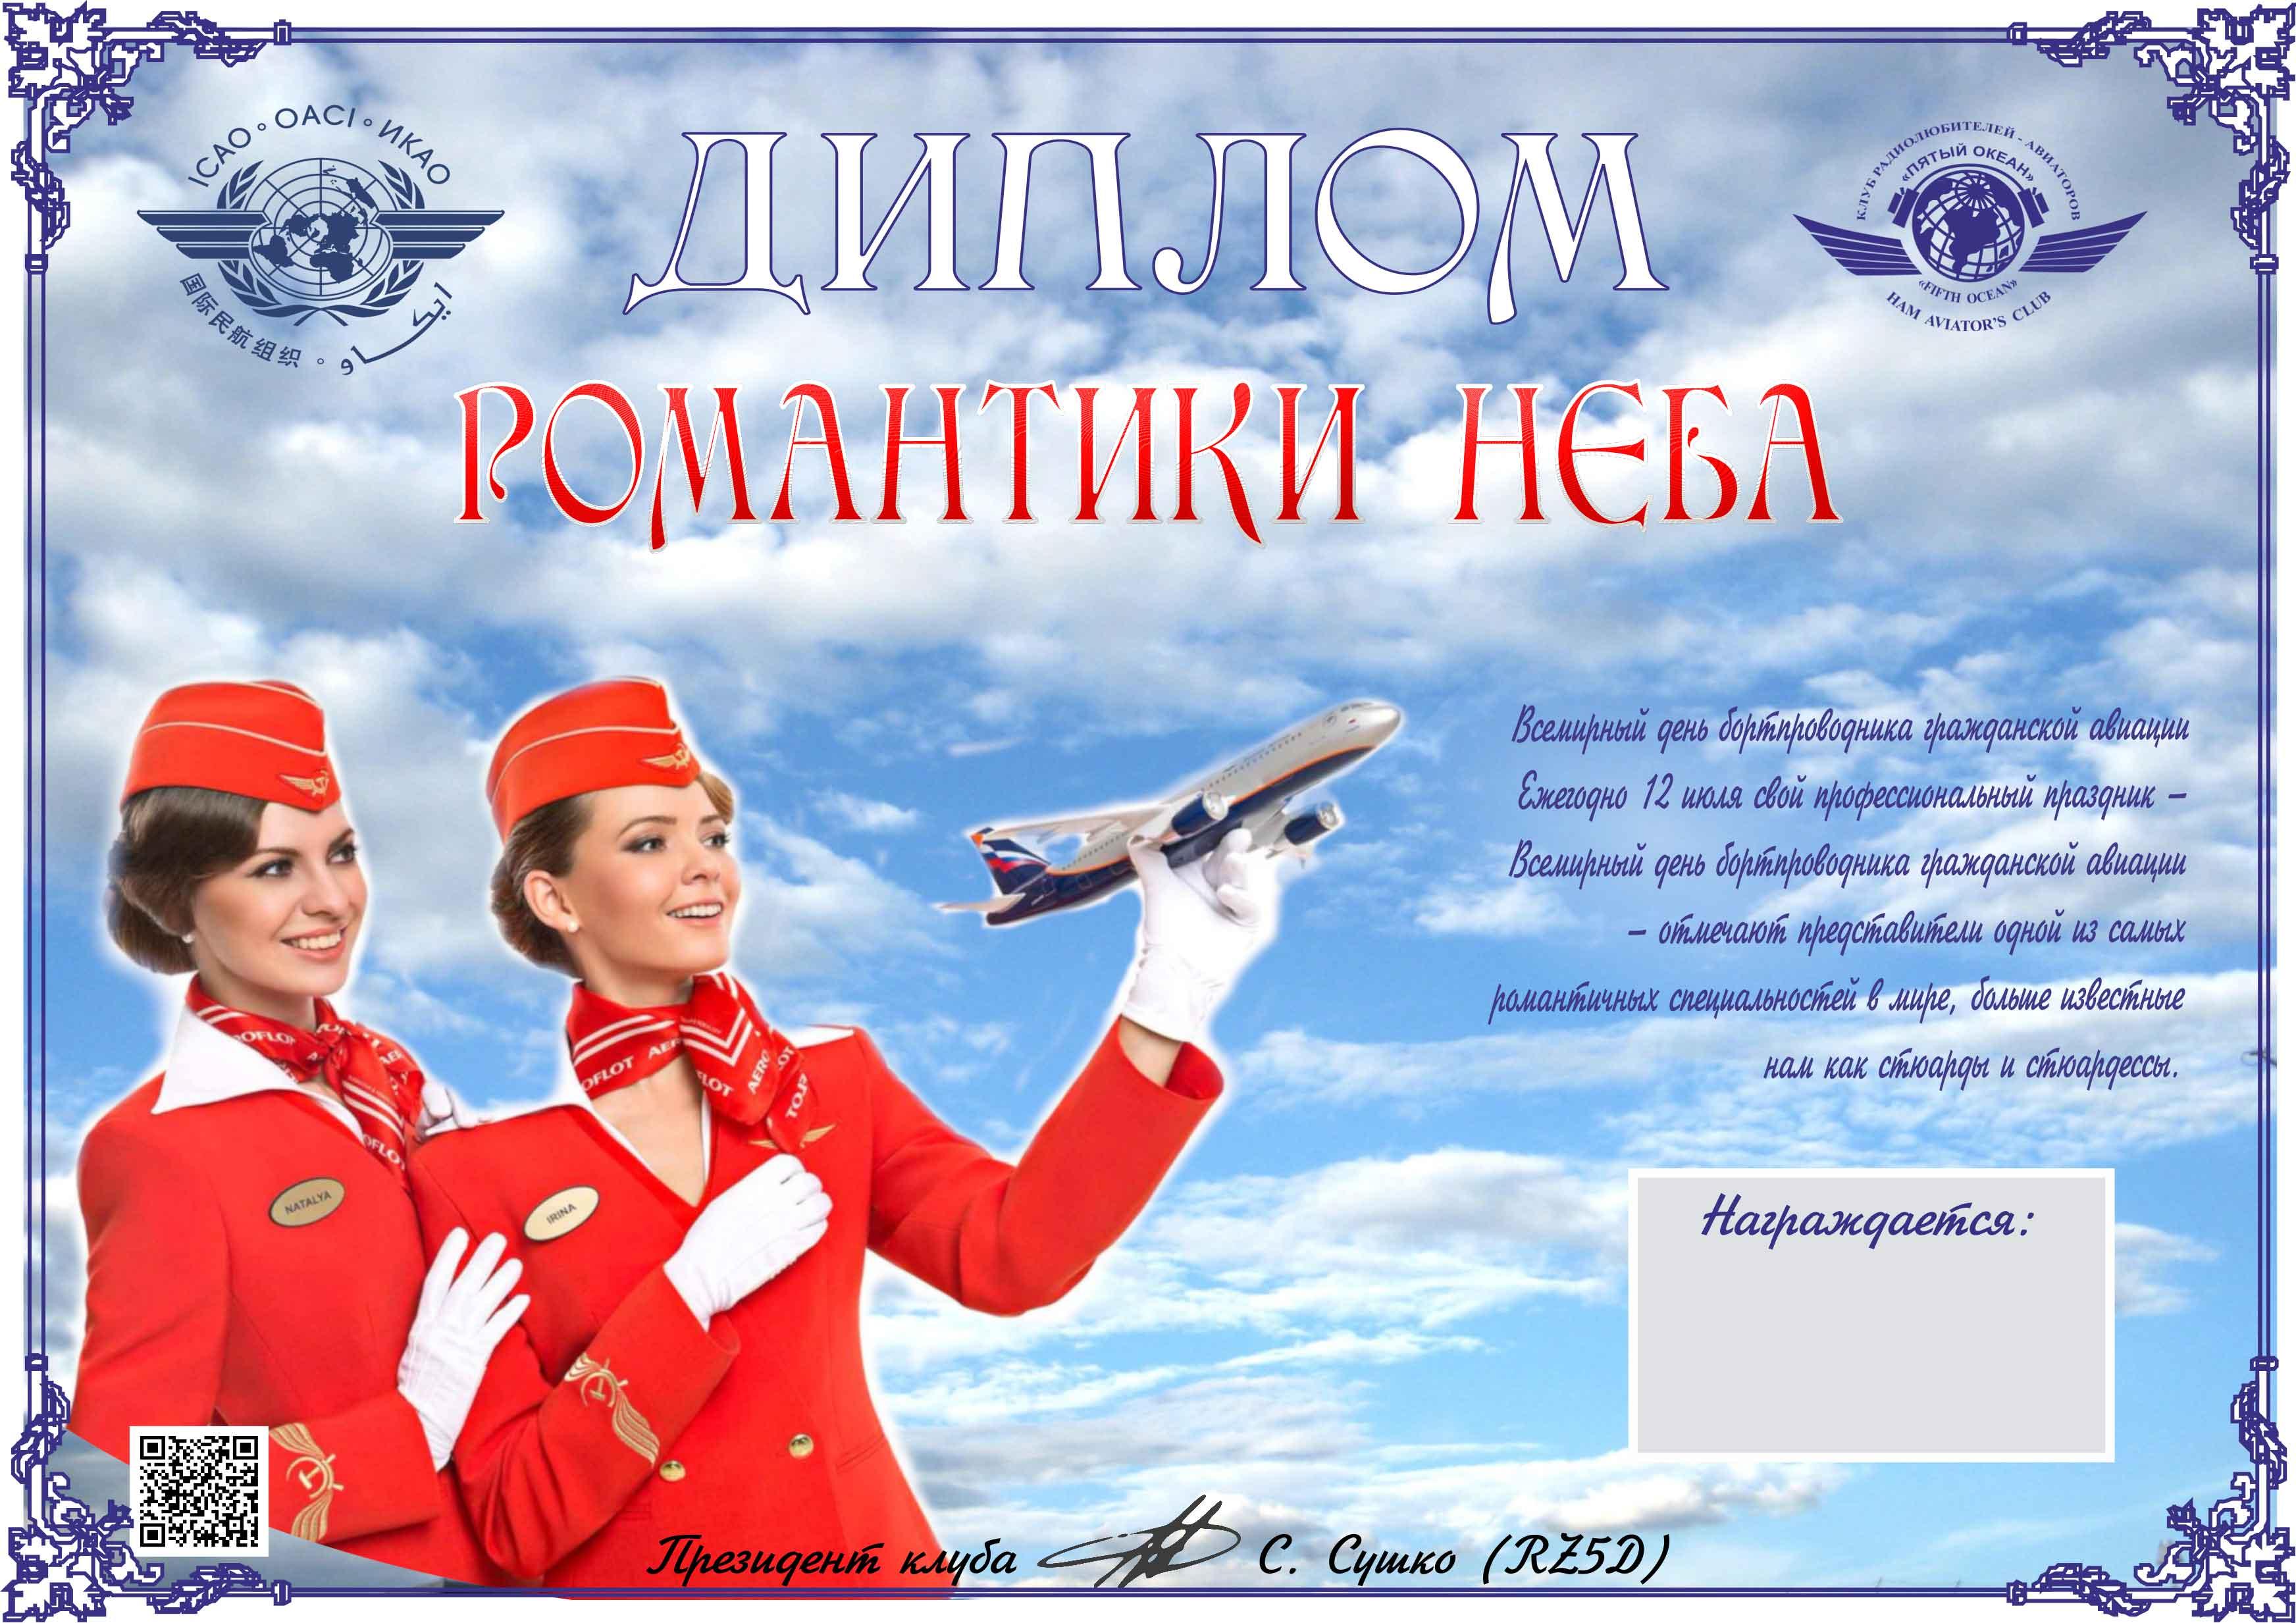 Картинки по запросу диплом «Романтики неба».